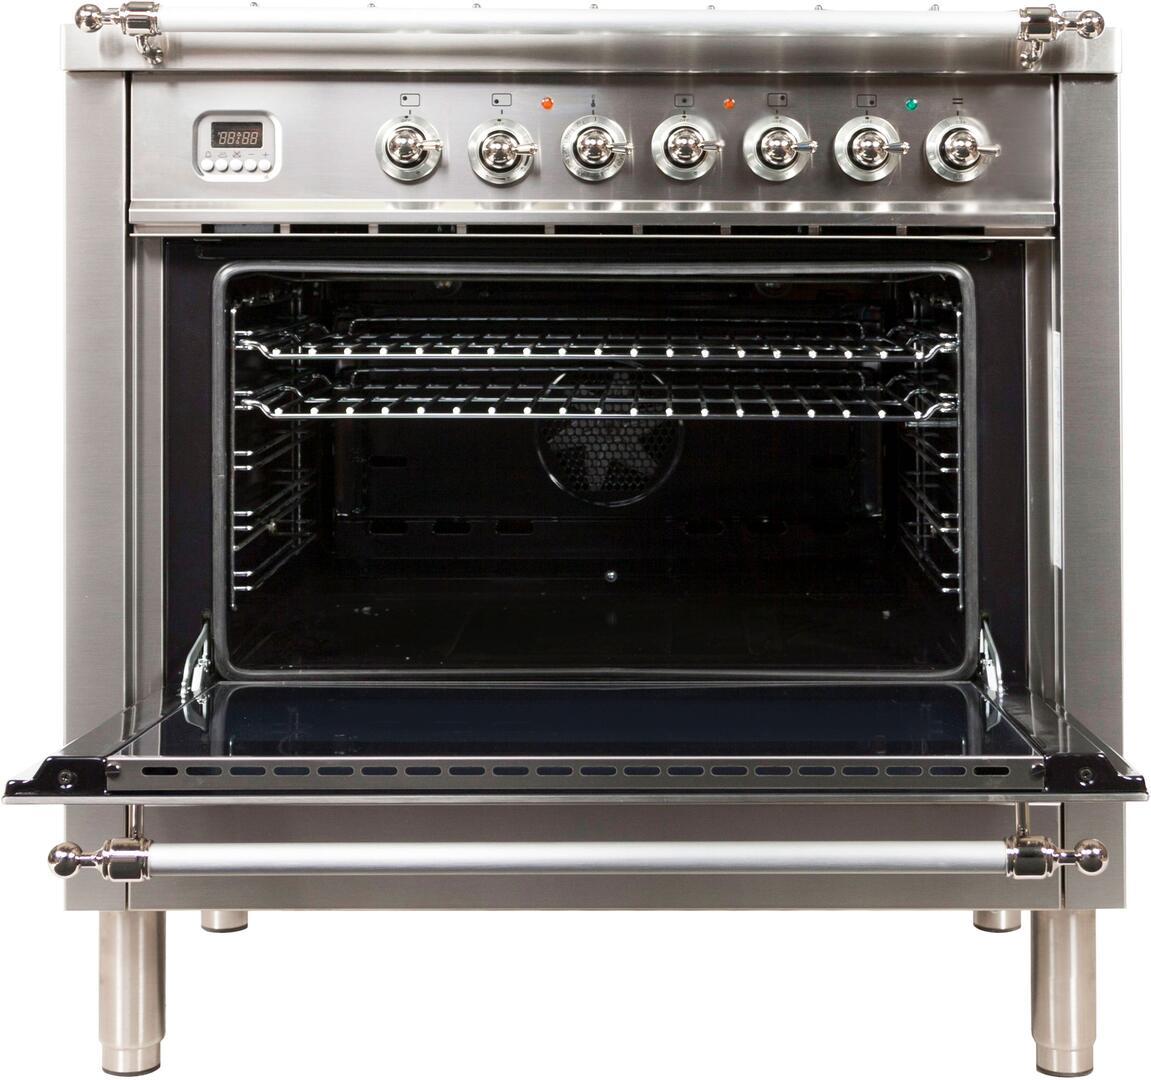 Ilve Nostalgie UPN90FDMPIX Freestanding Dual Fuel Range Stainless Steel, UPN90FDMPIX Oven Door Opened